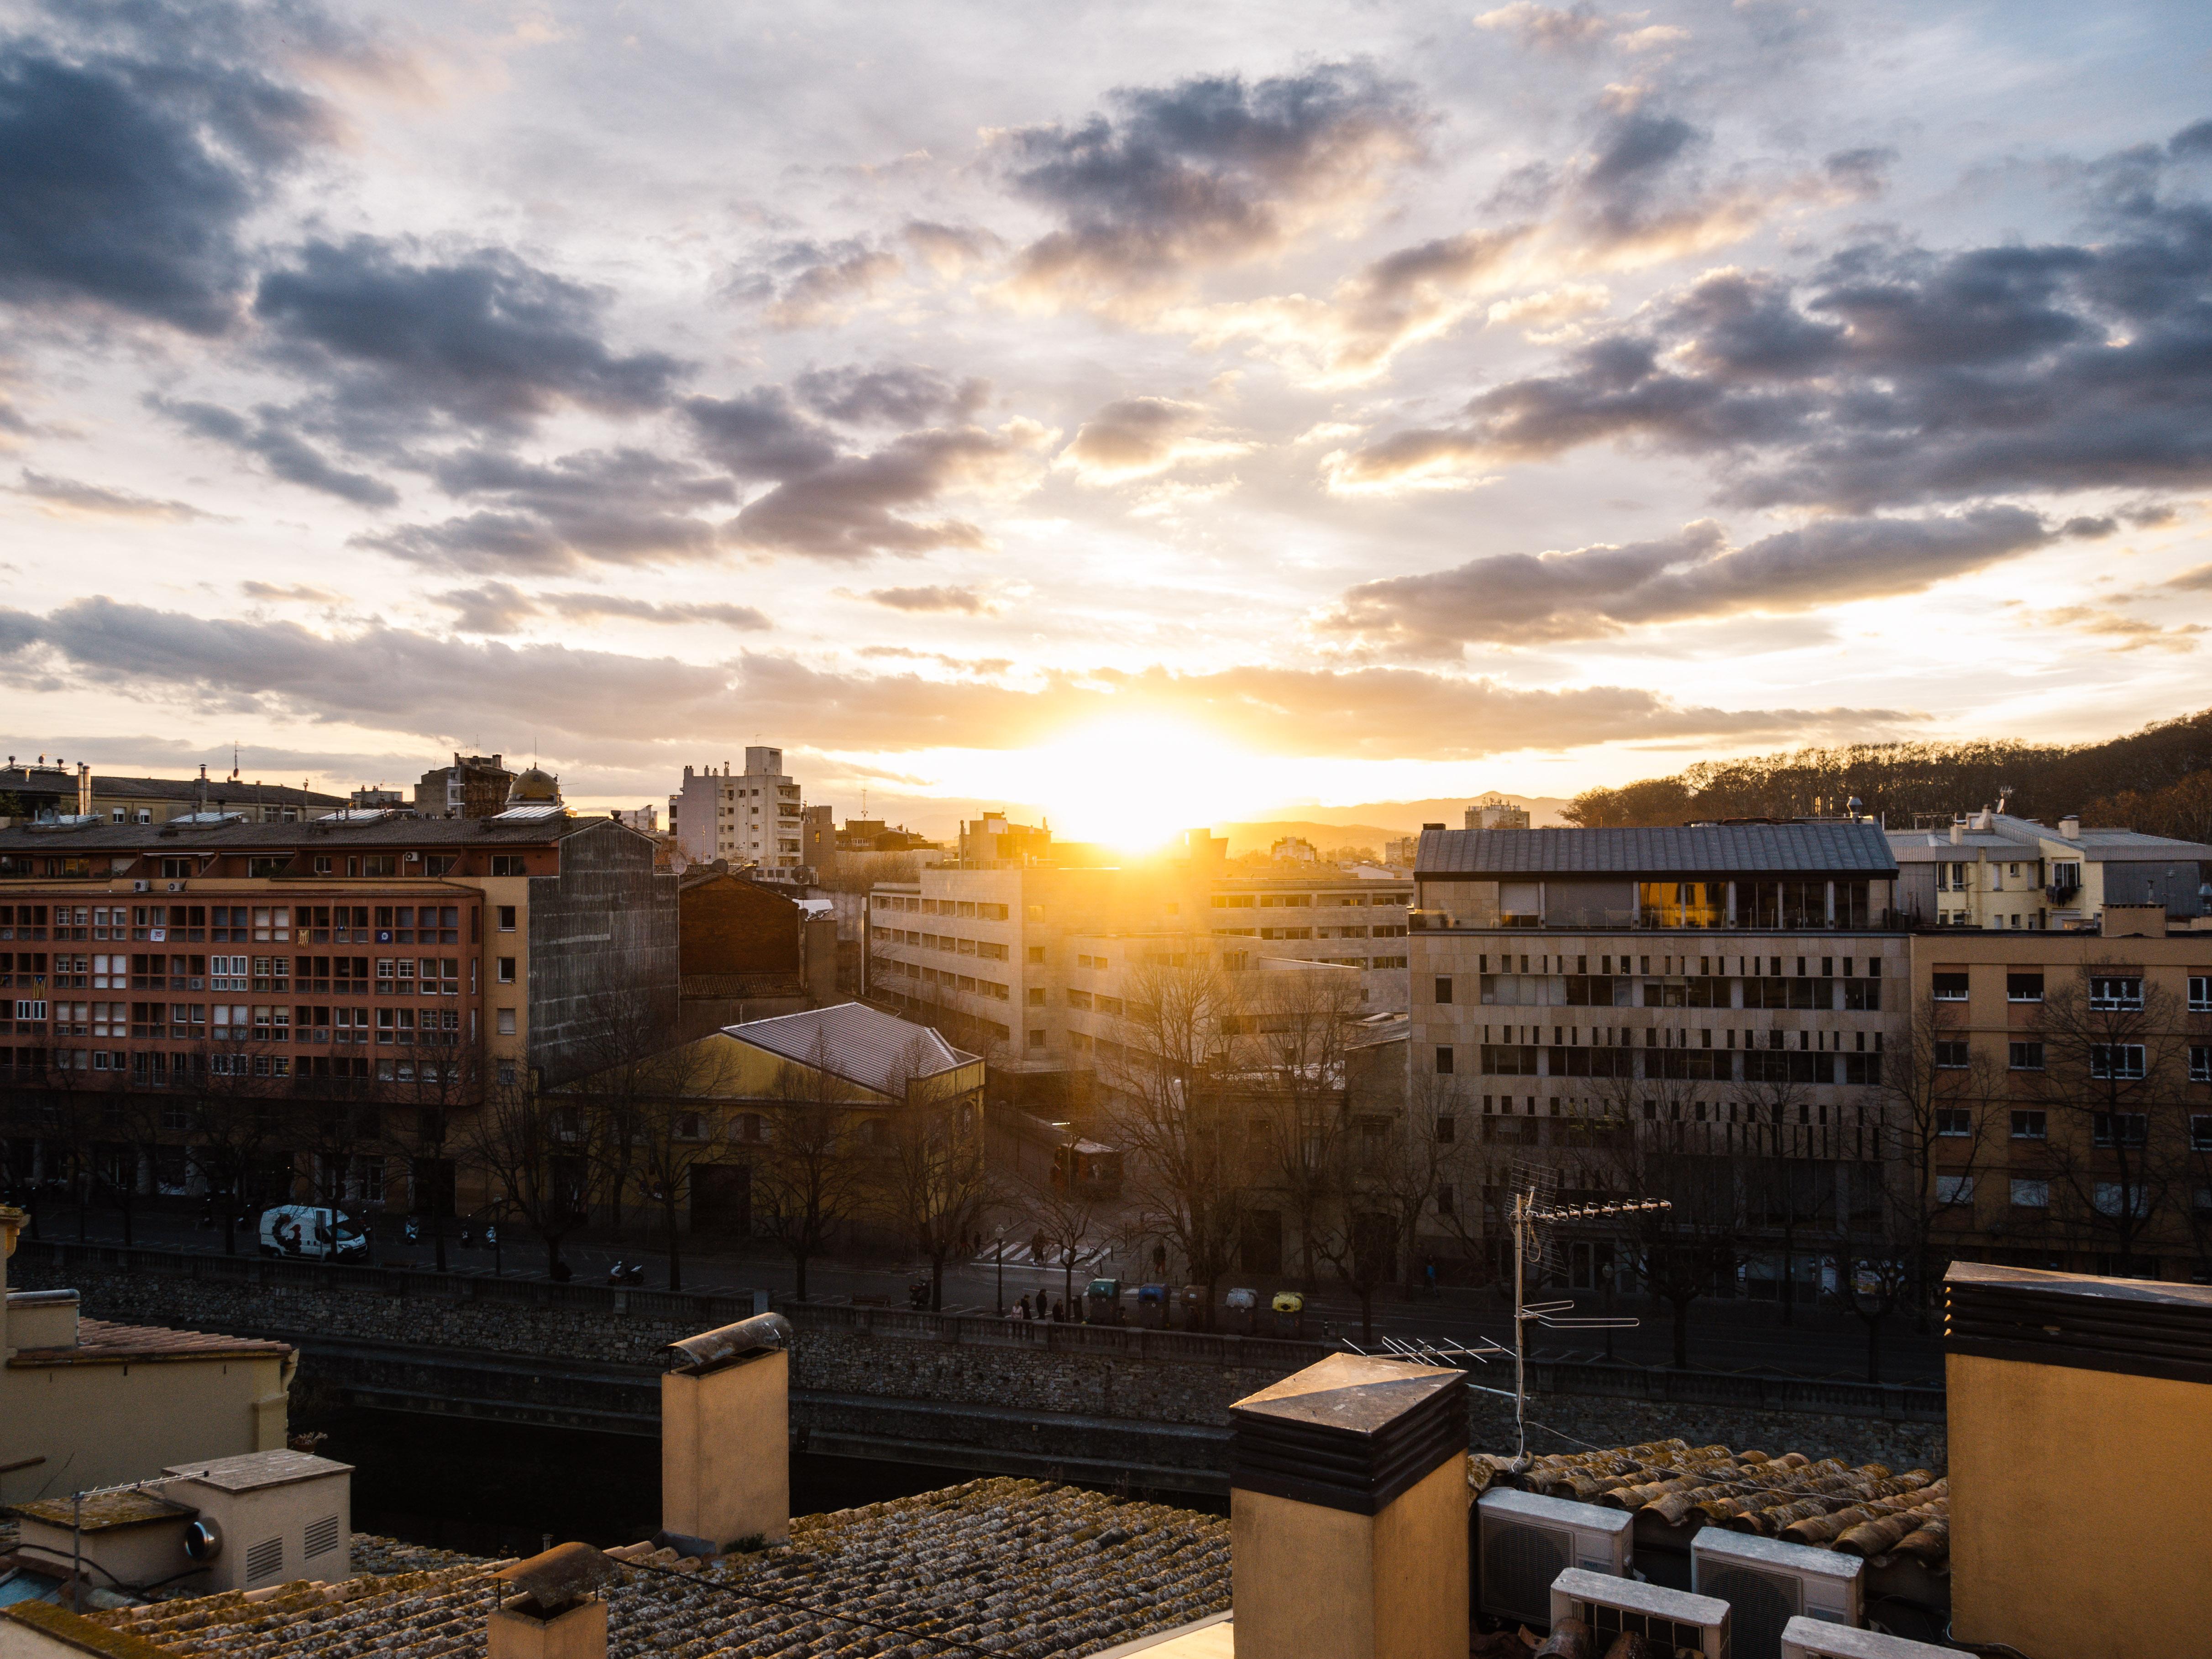 Sunset over Girona